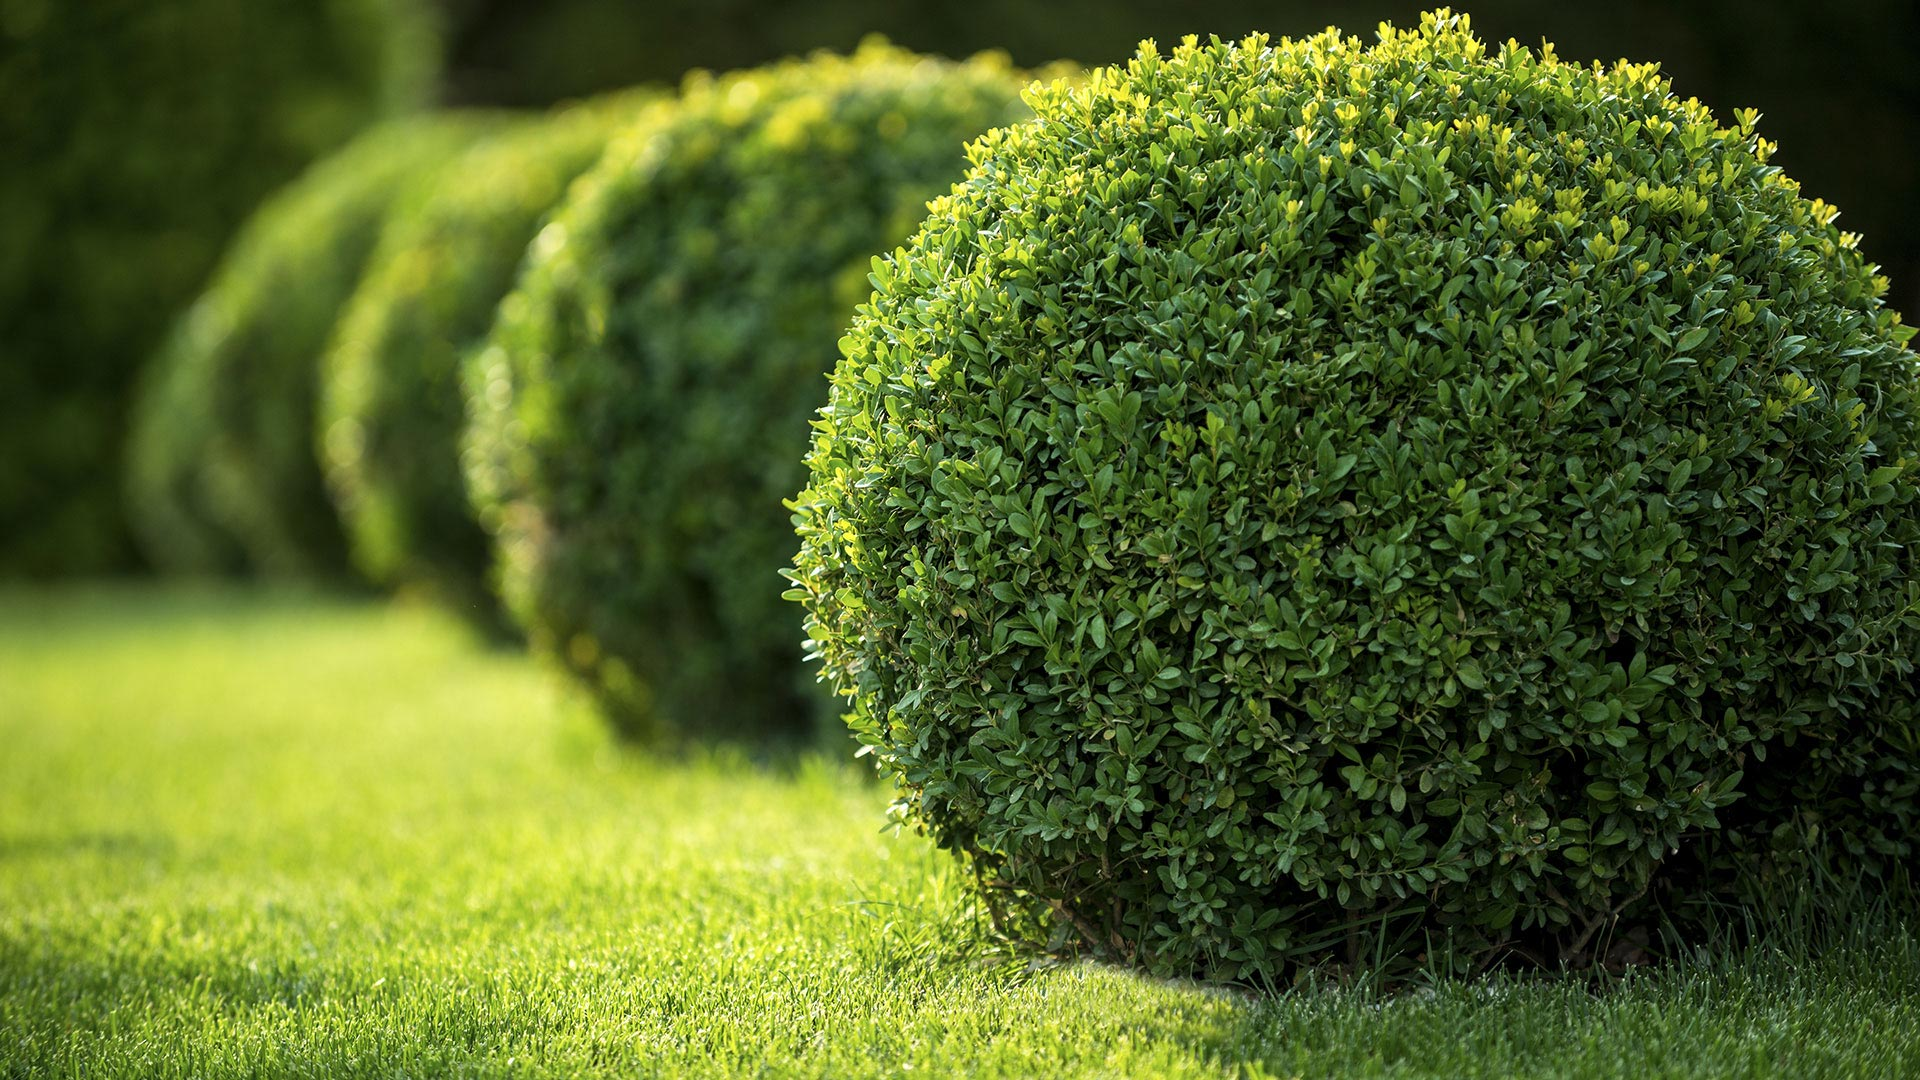 J & E Lawn Service LLC Landscaping, Lawn Maintenance and Irrigation slide 1